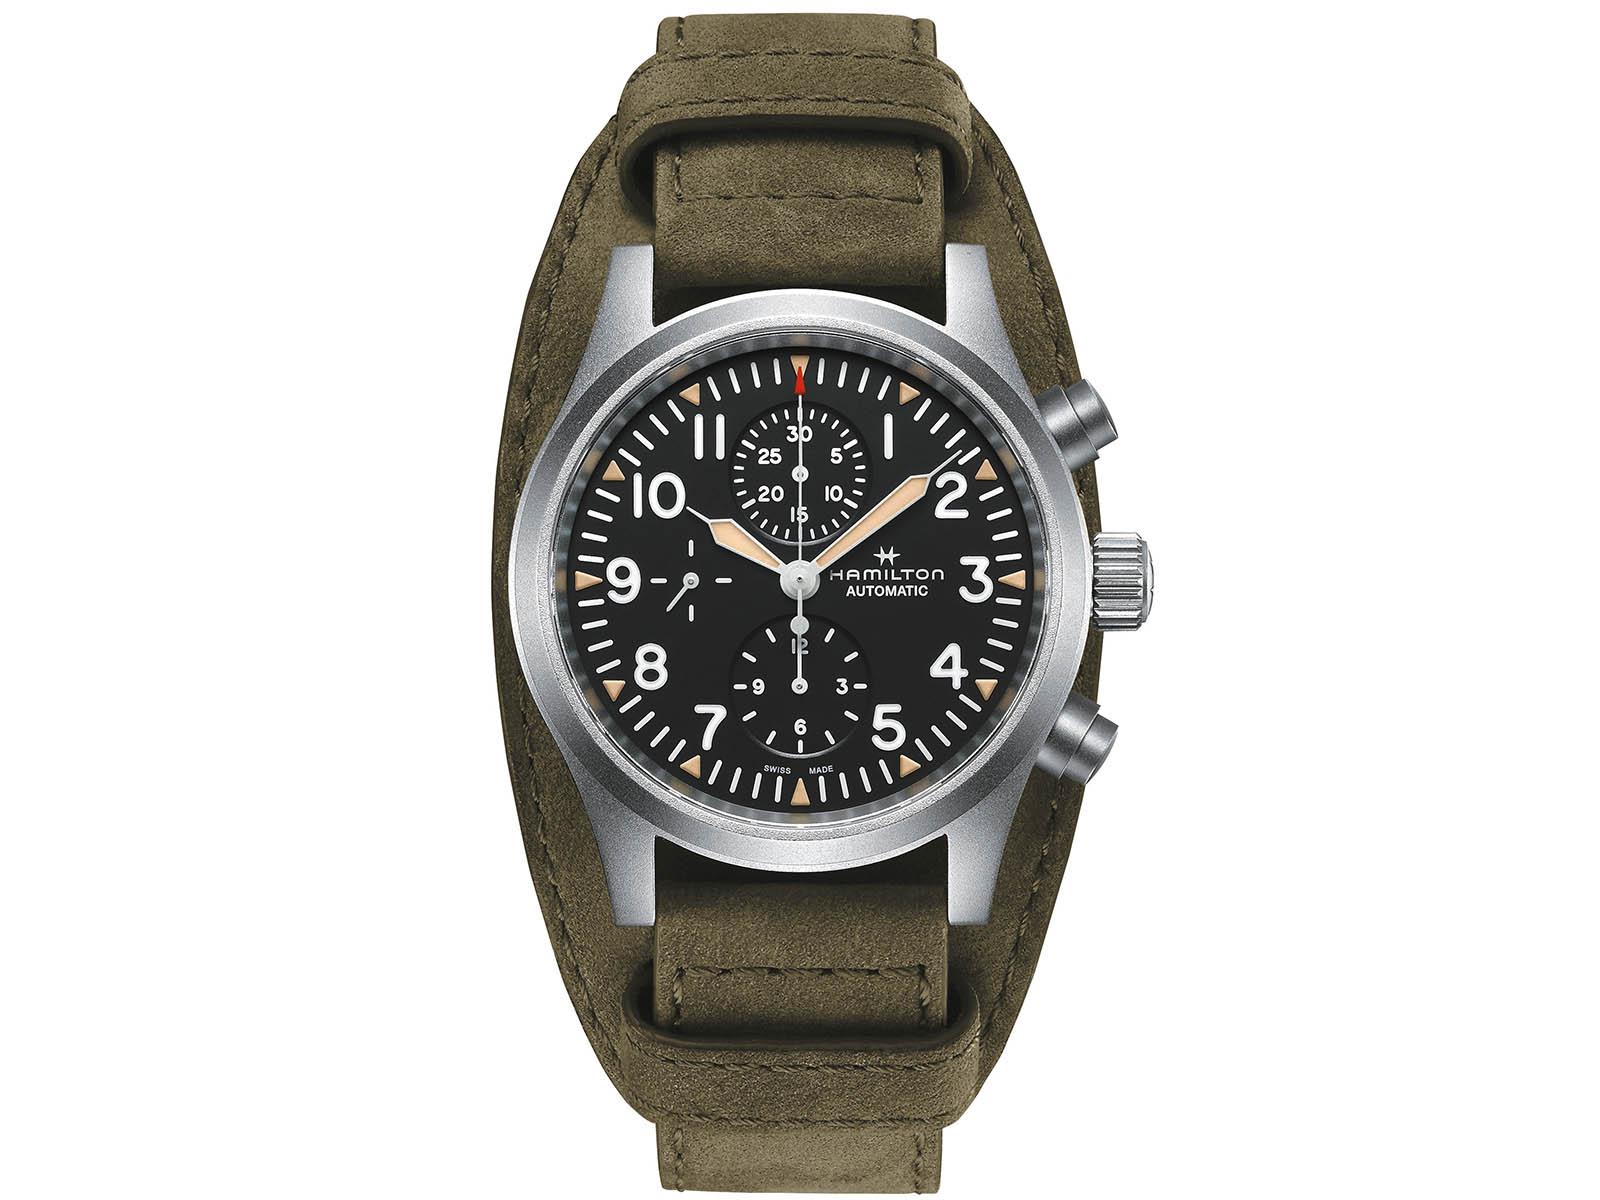 h71706830-hamilton-khaki-field-automatic-chronograph-9.jpg